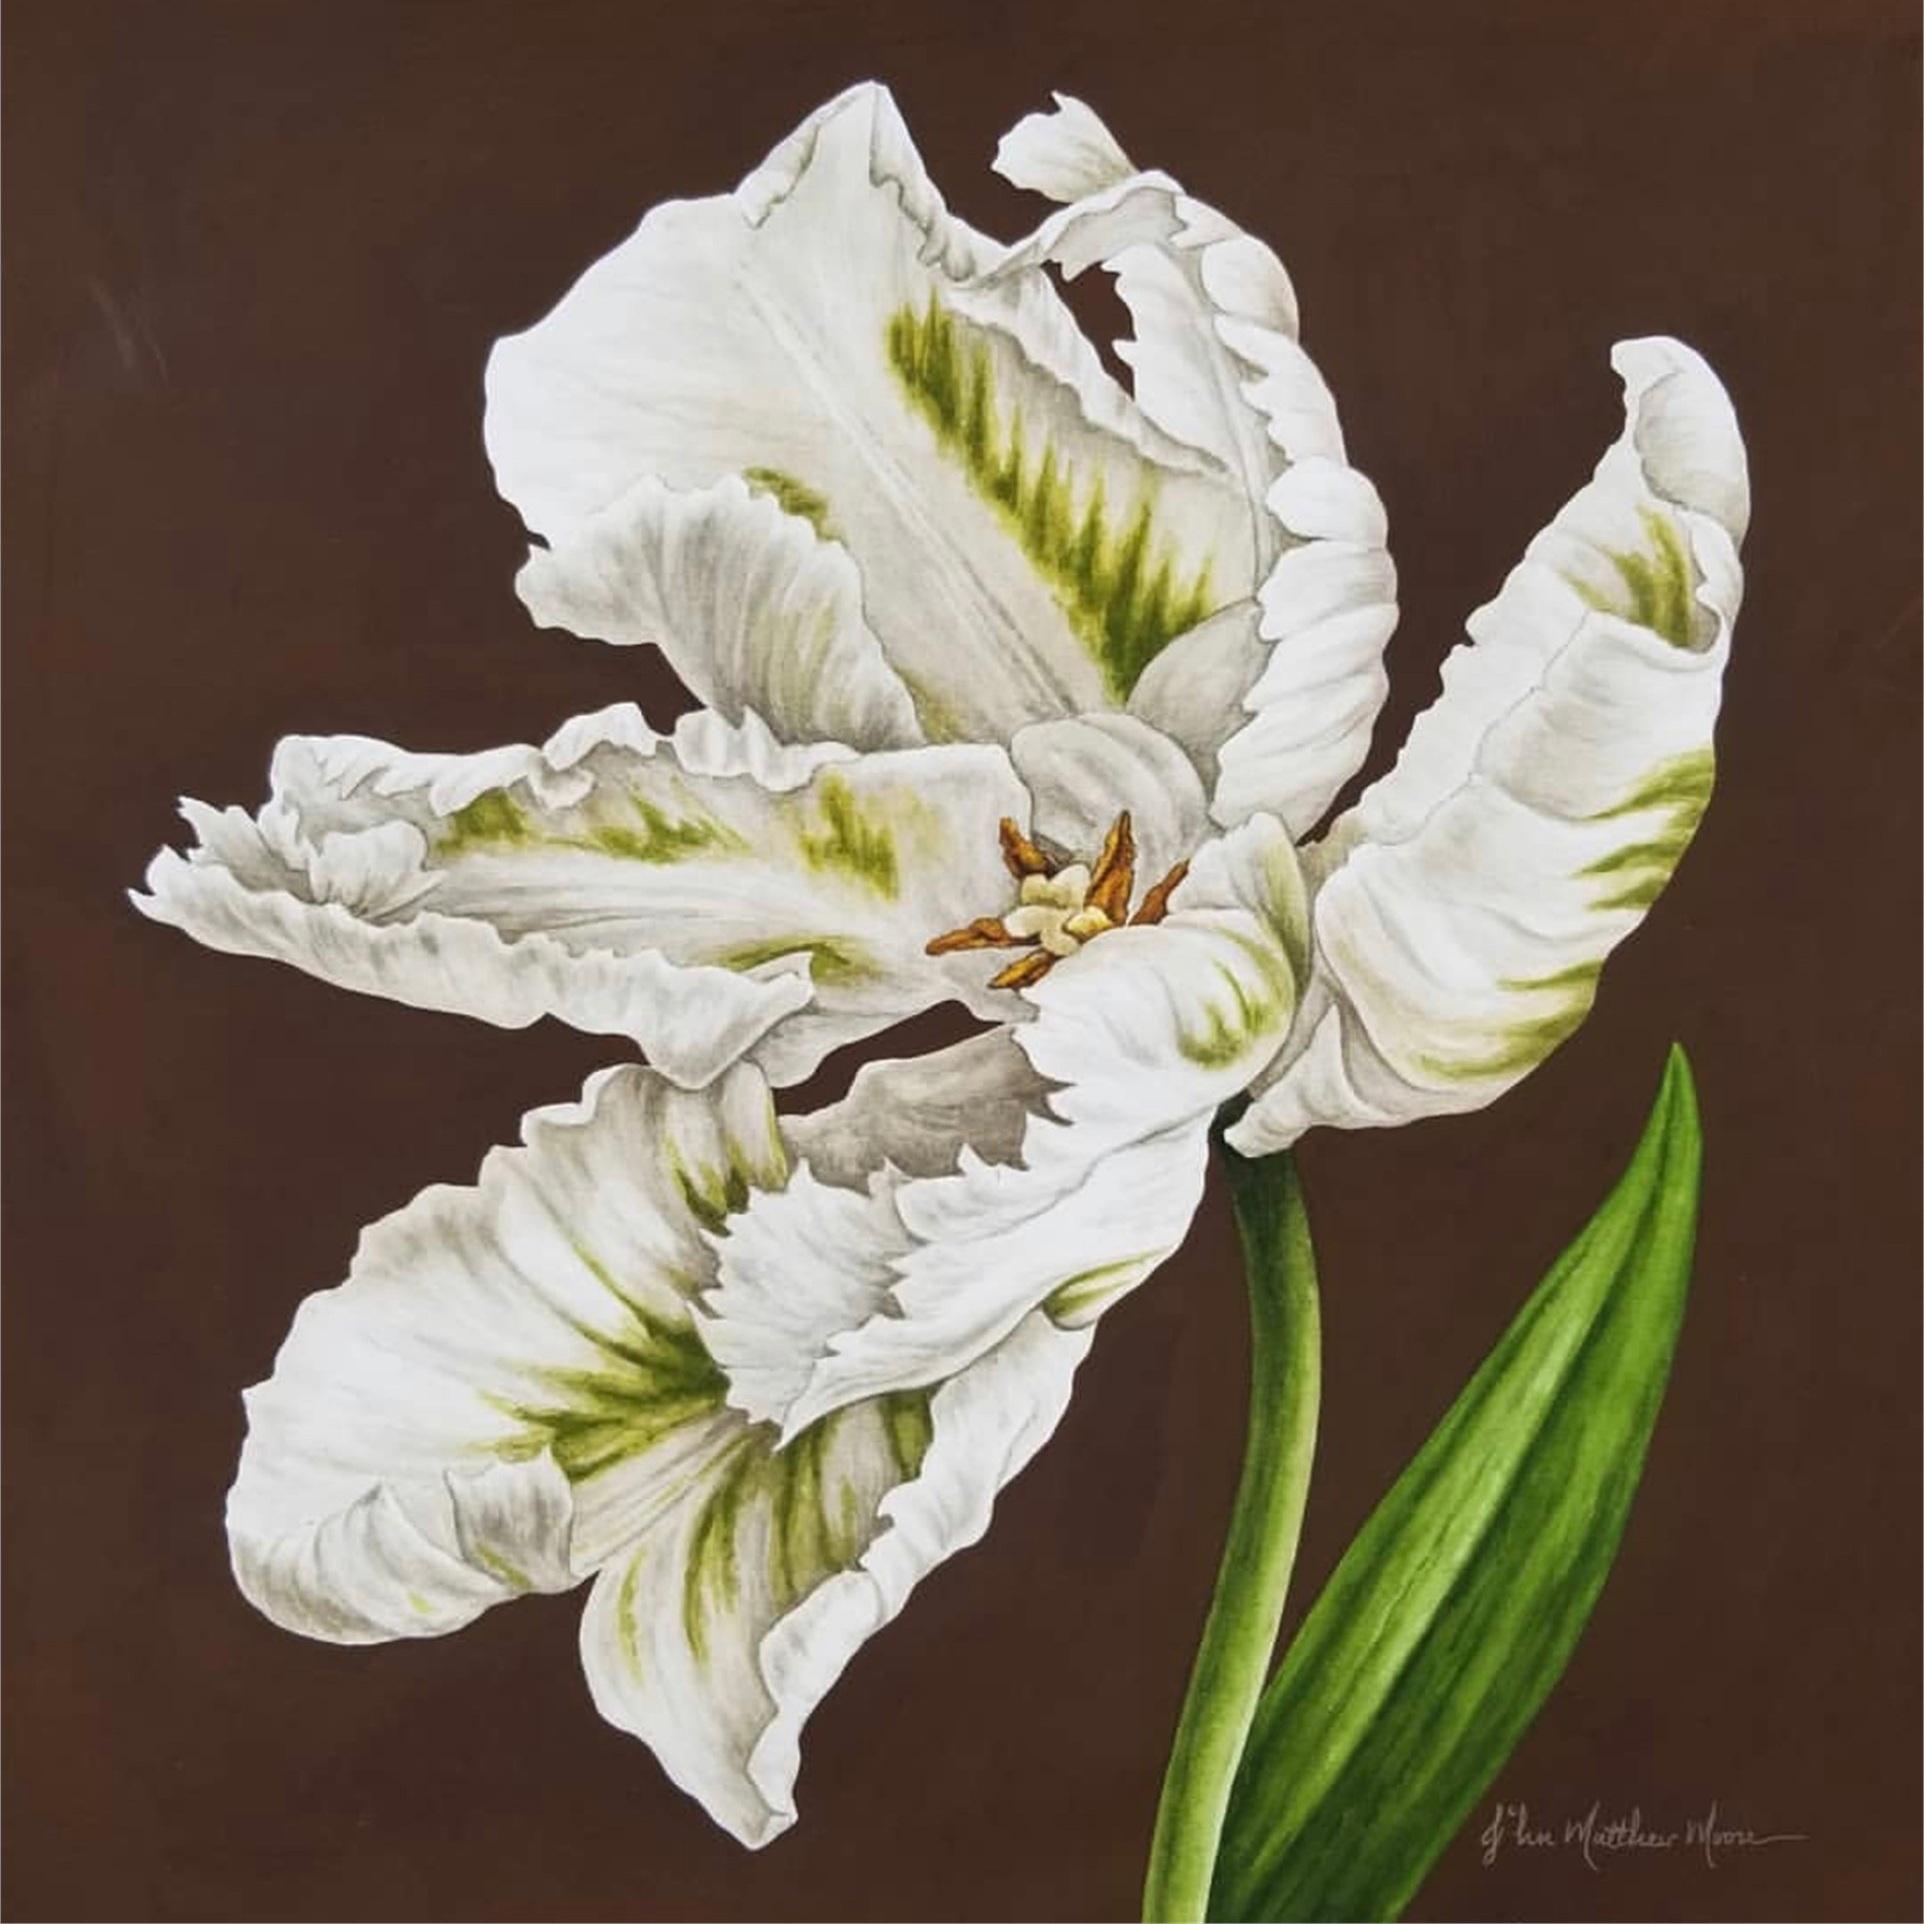 Tulipia, Madonna -